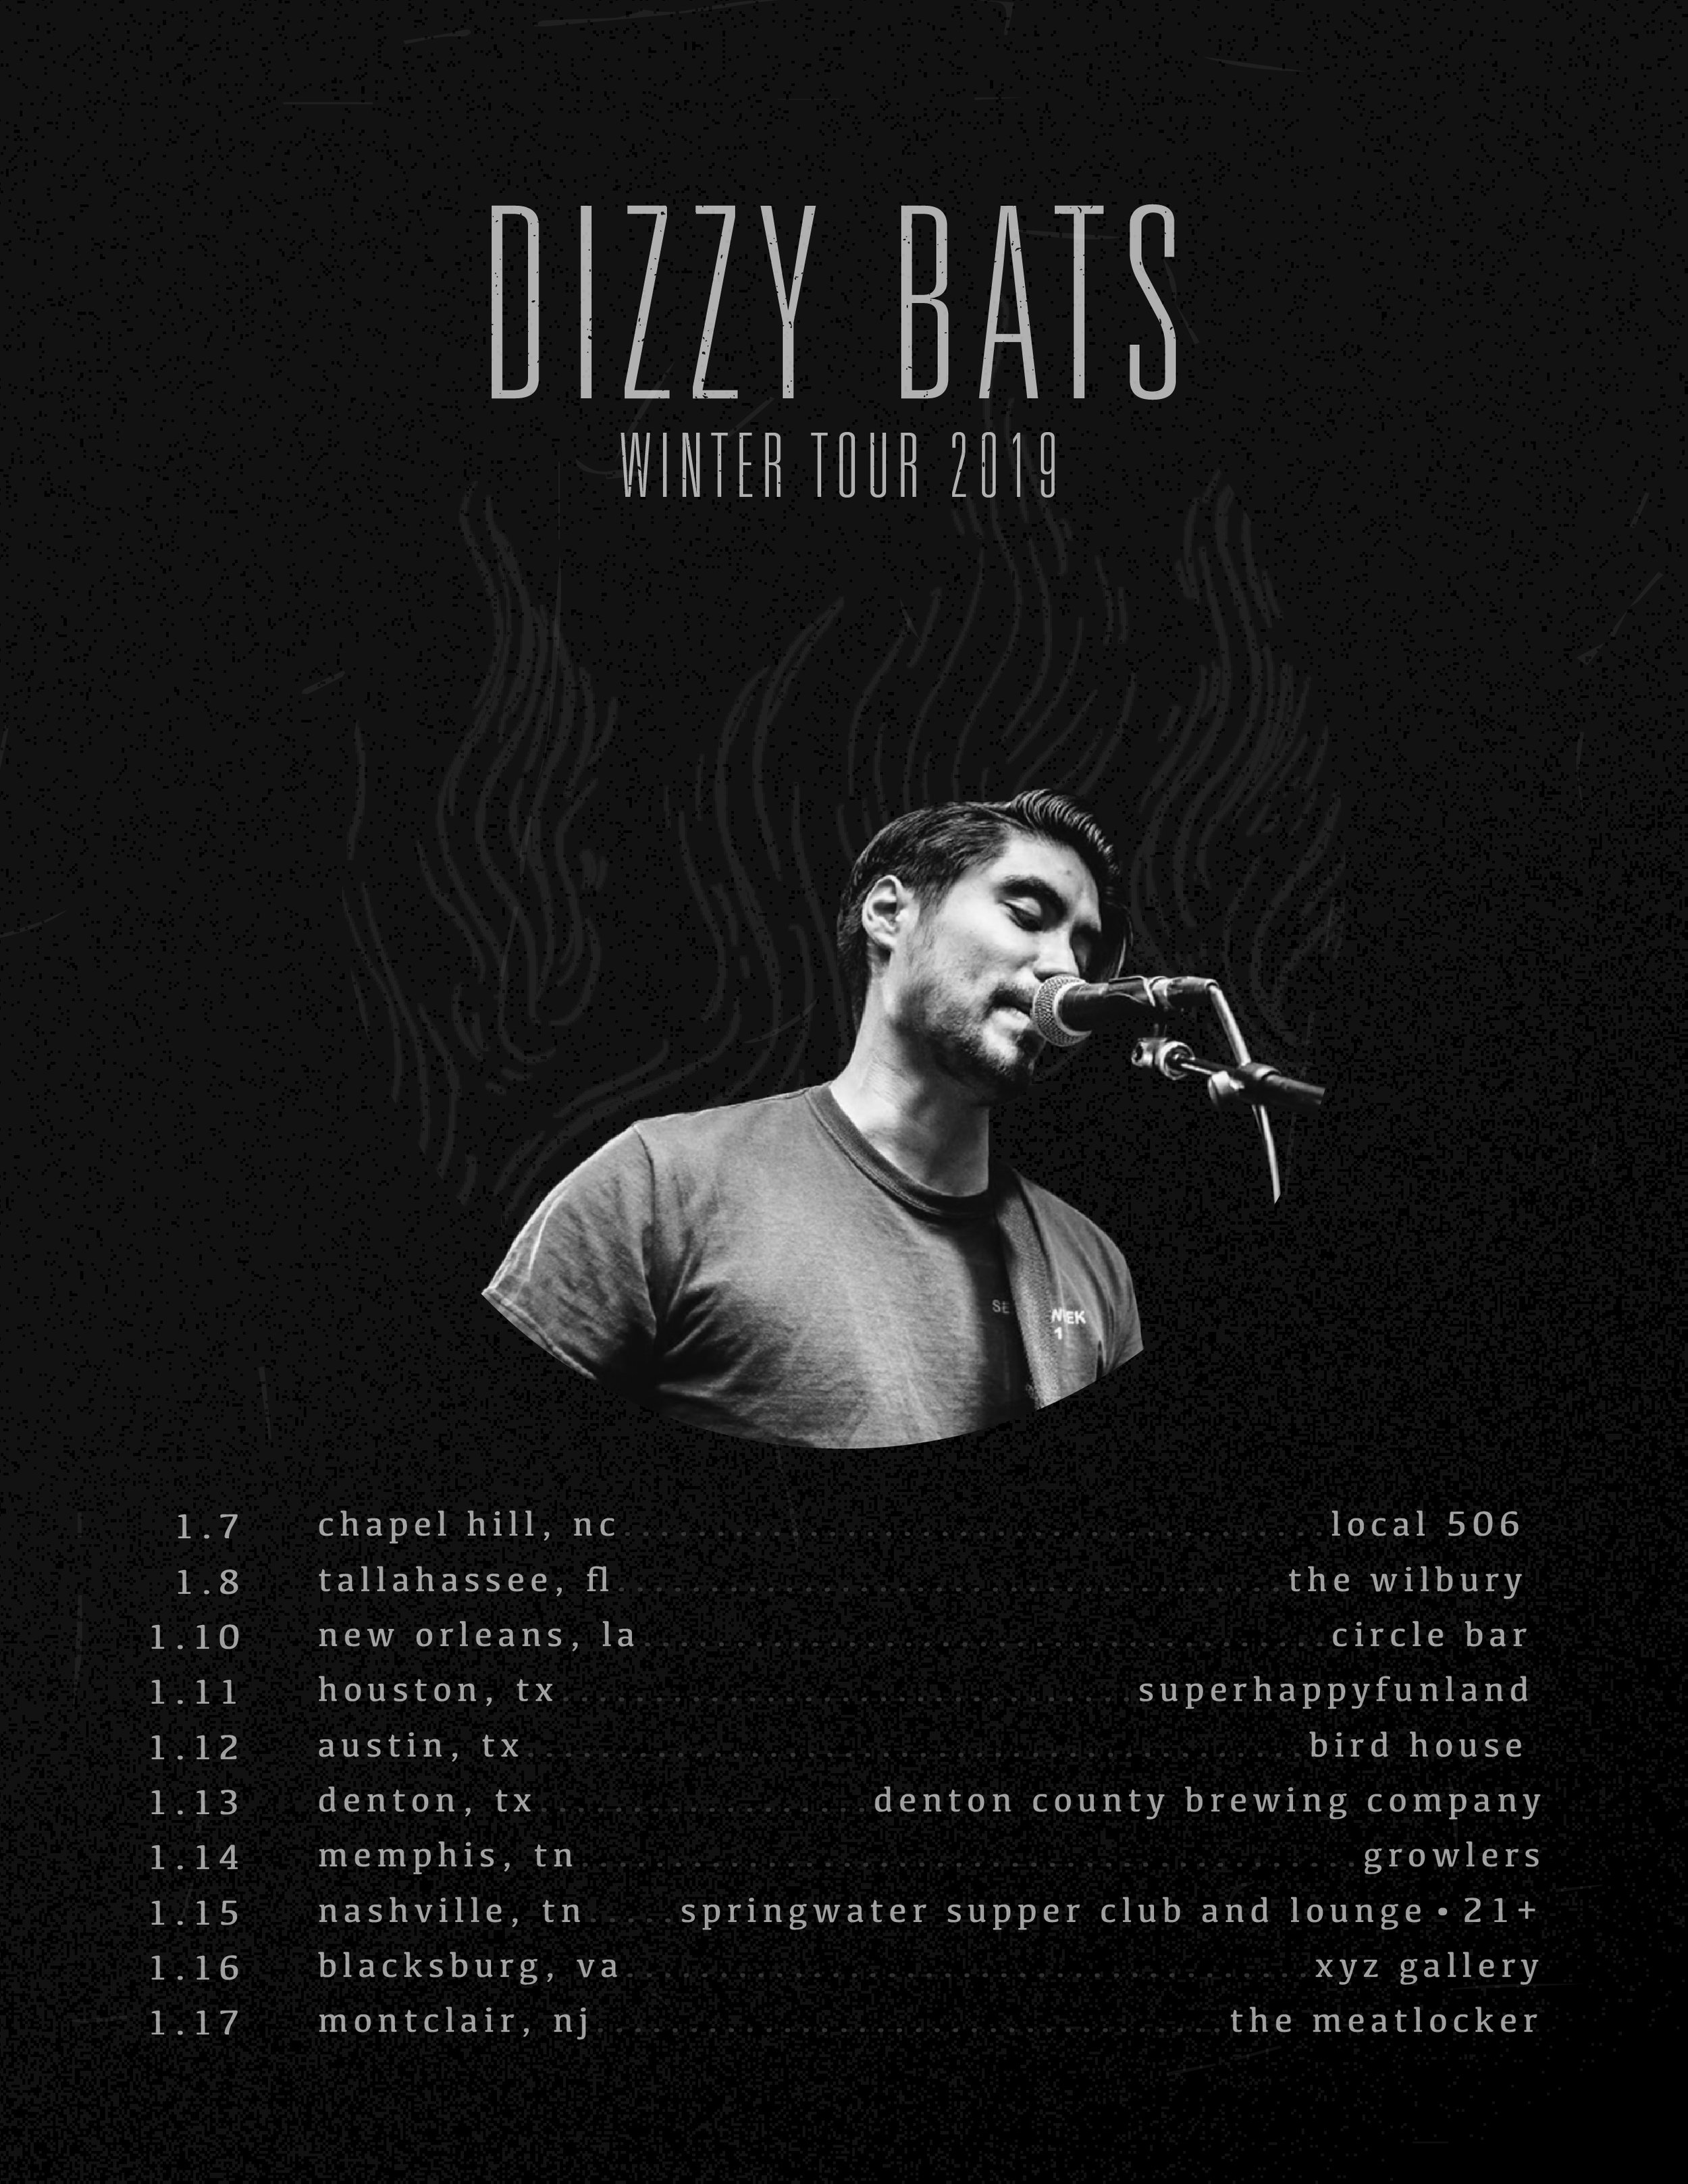 dizzybats-winter-2019.jpg